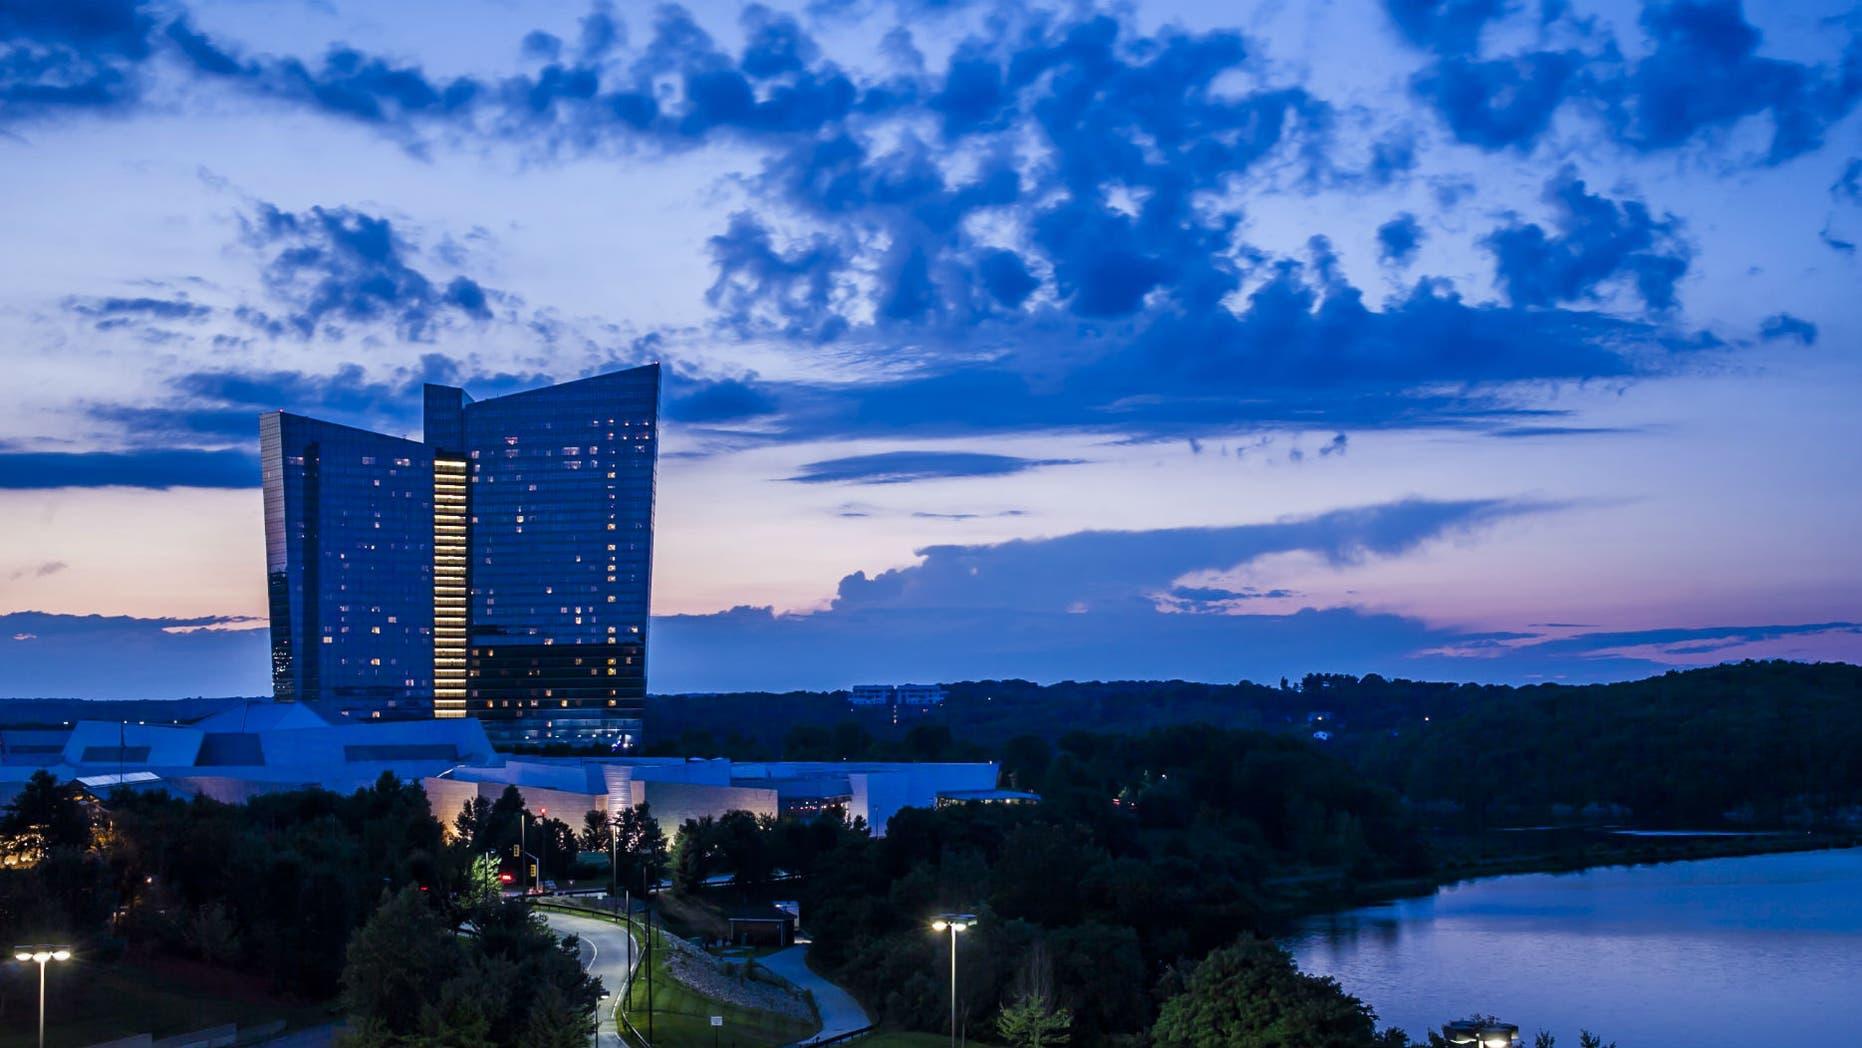 Is Mohegan Sun near Boston better than a Vegas casino?